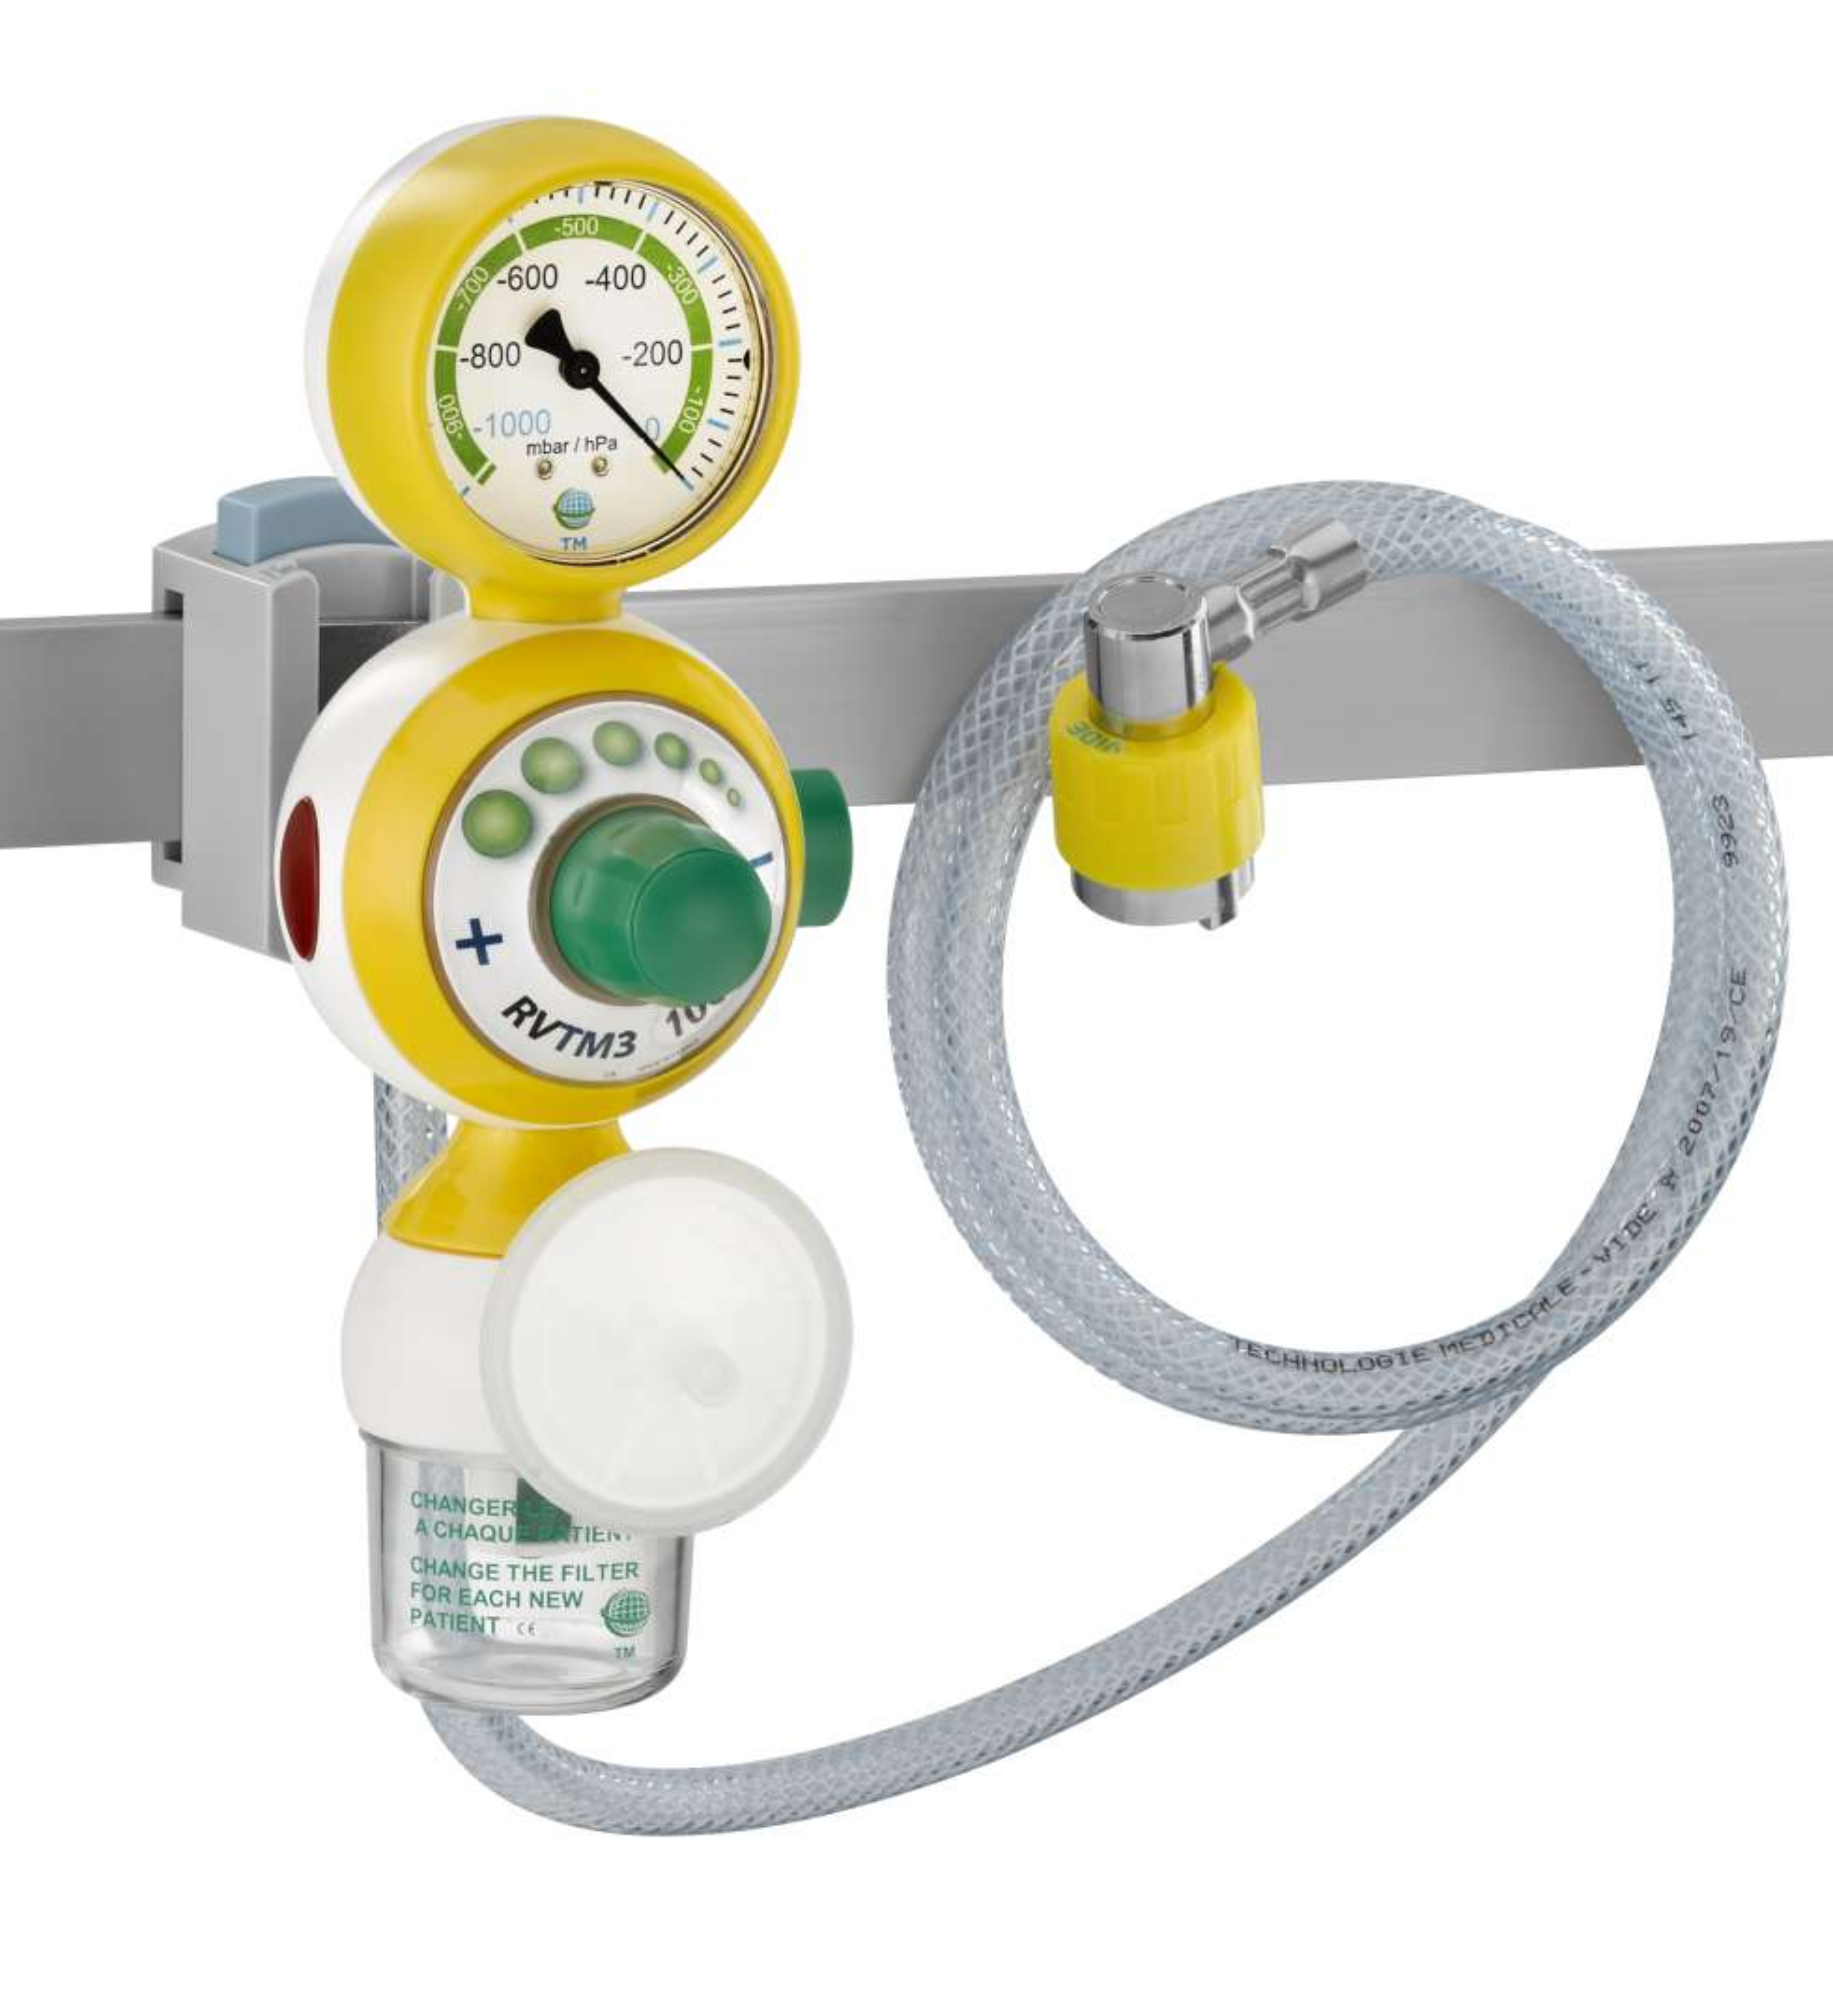 Vacuum regulators – RVTM3 – Technologie Médicale